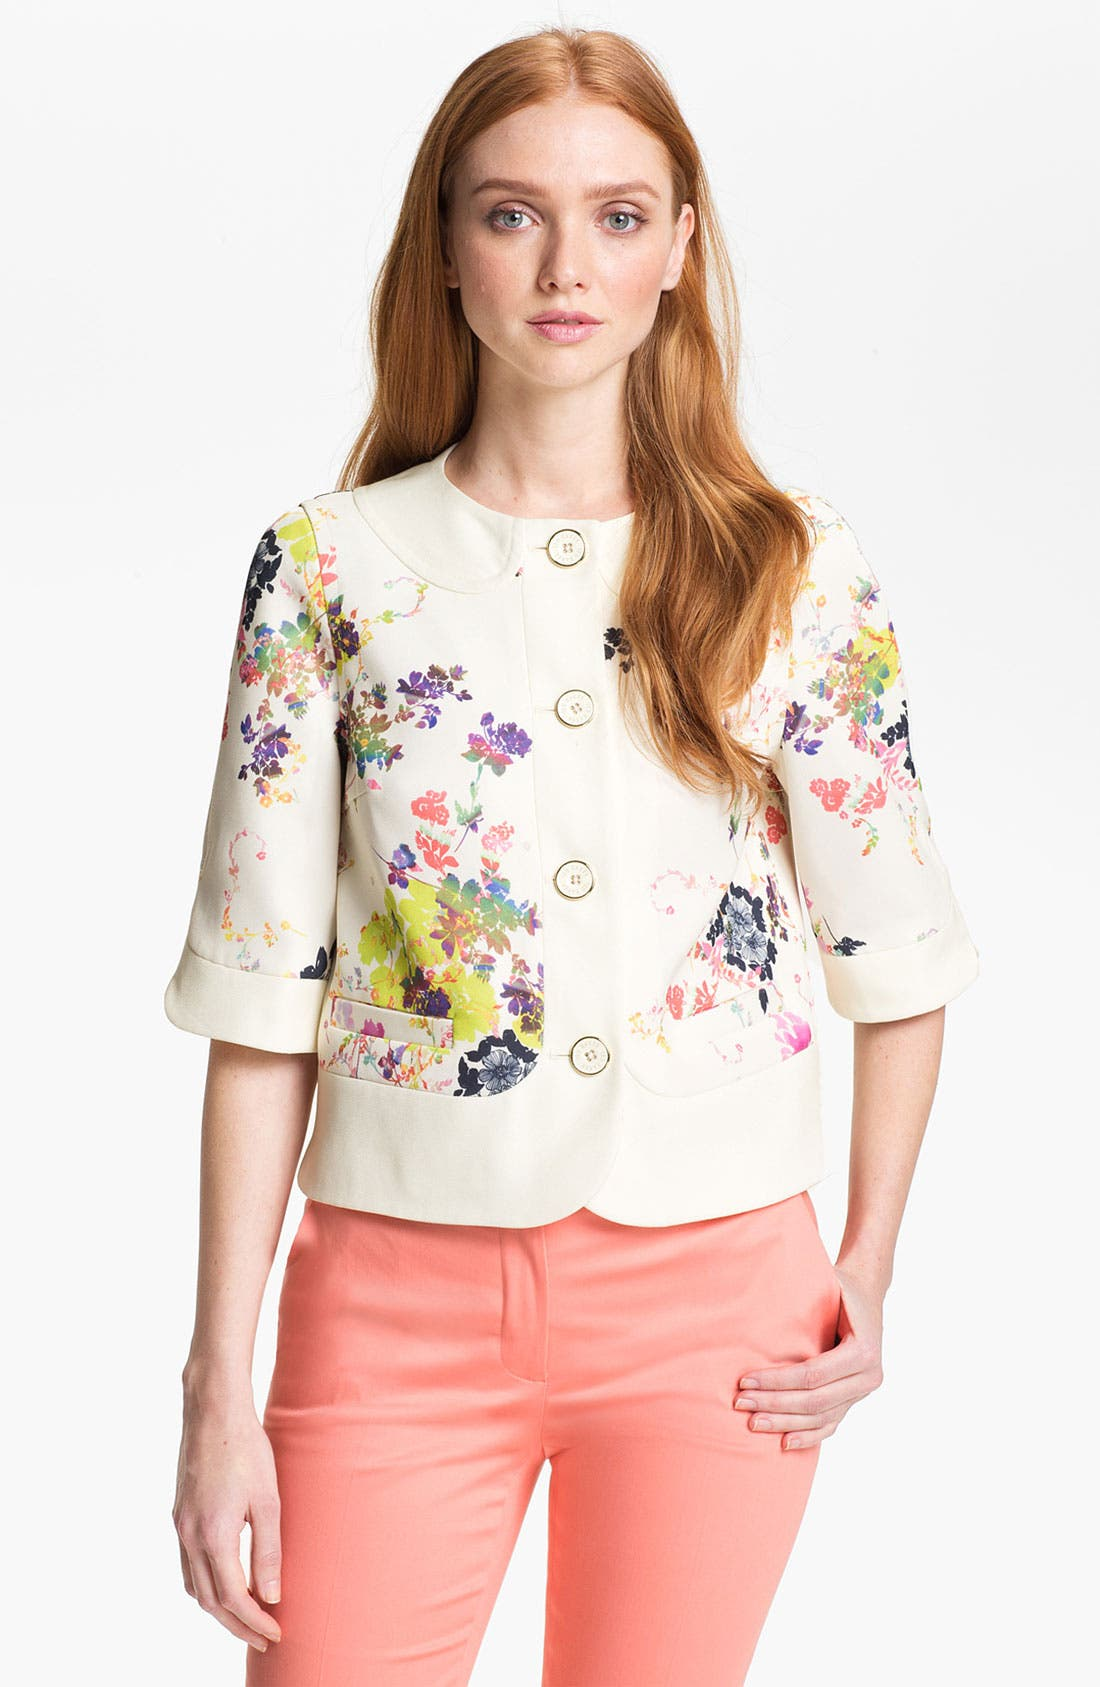 Main Image - Ted Baker London 'Summer Bloom' Print Jacket